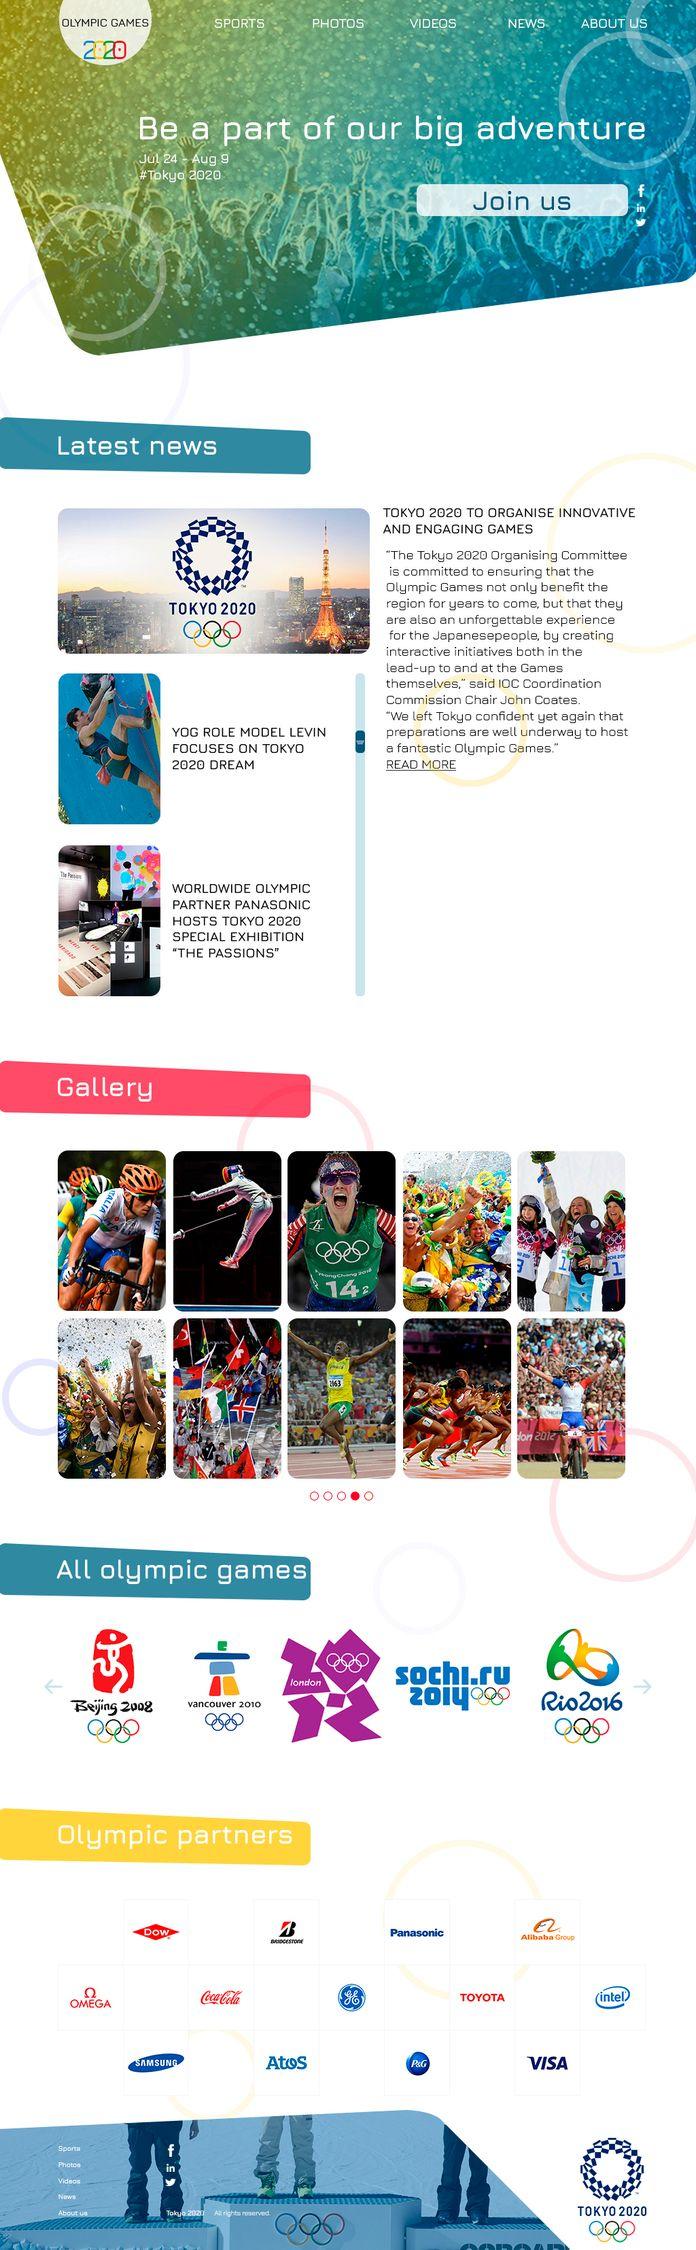 Olympic Games 2020 Blog - meristepanyan | ello